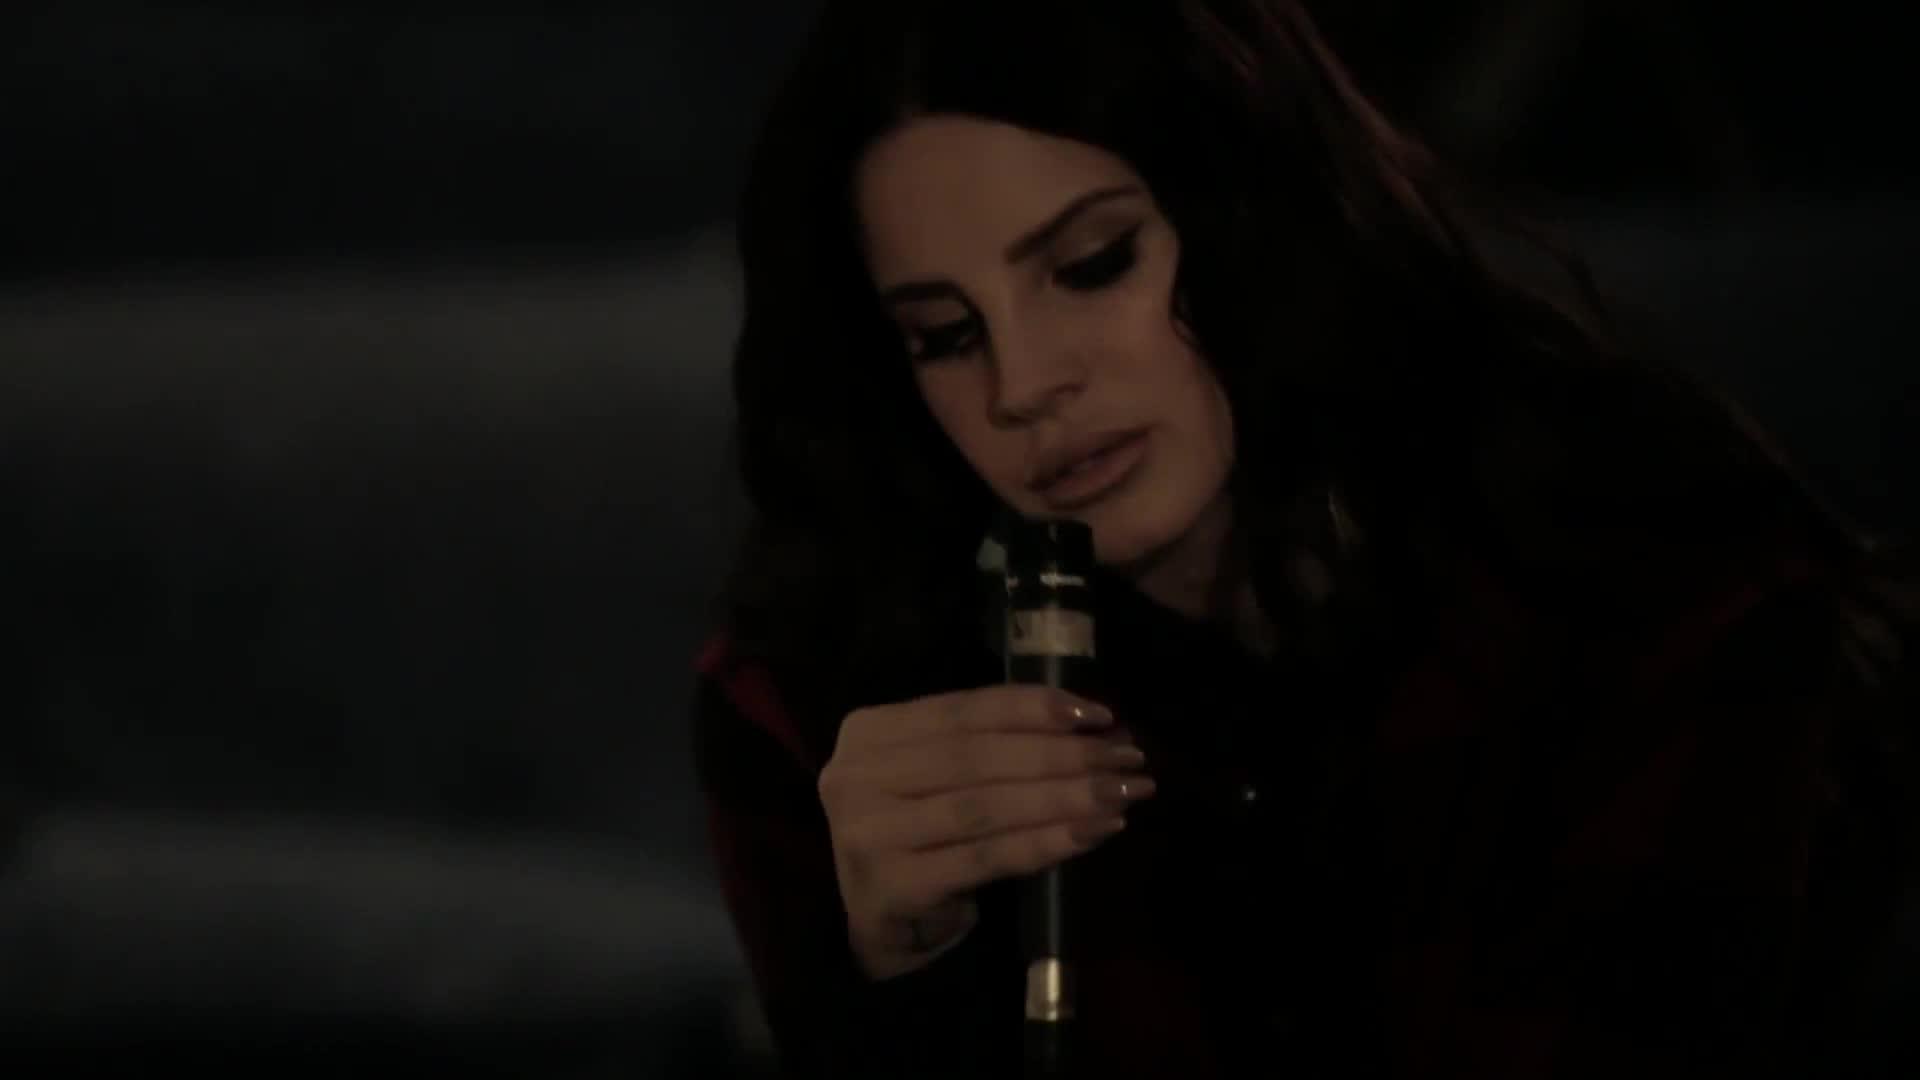 Lana Del Rey - Chelsea Hotel No 2 {Music Video}